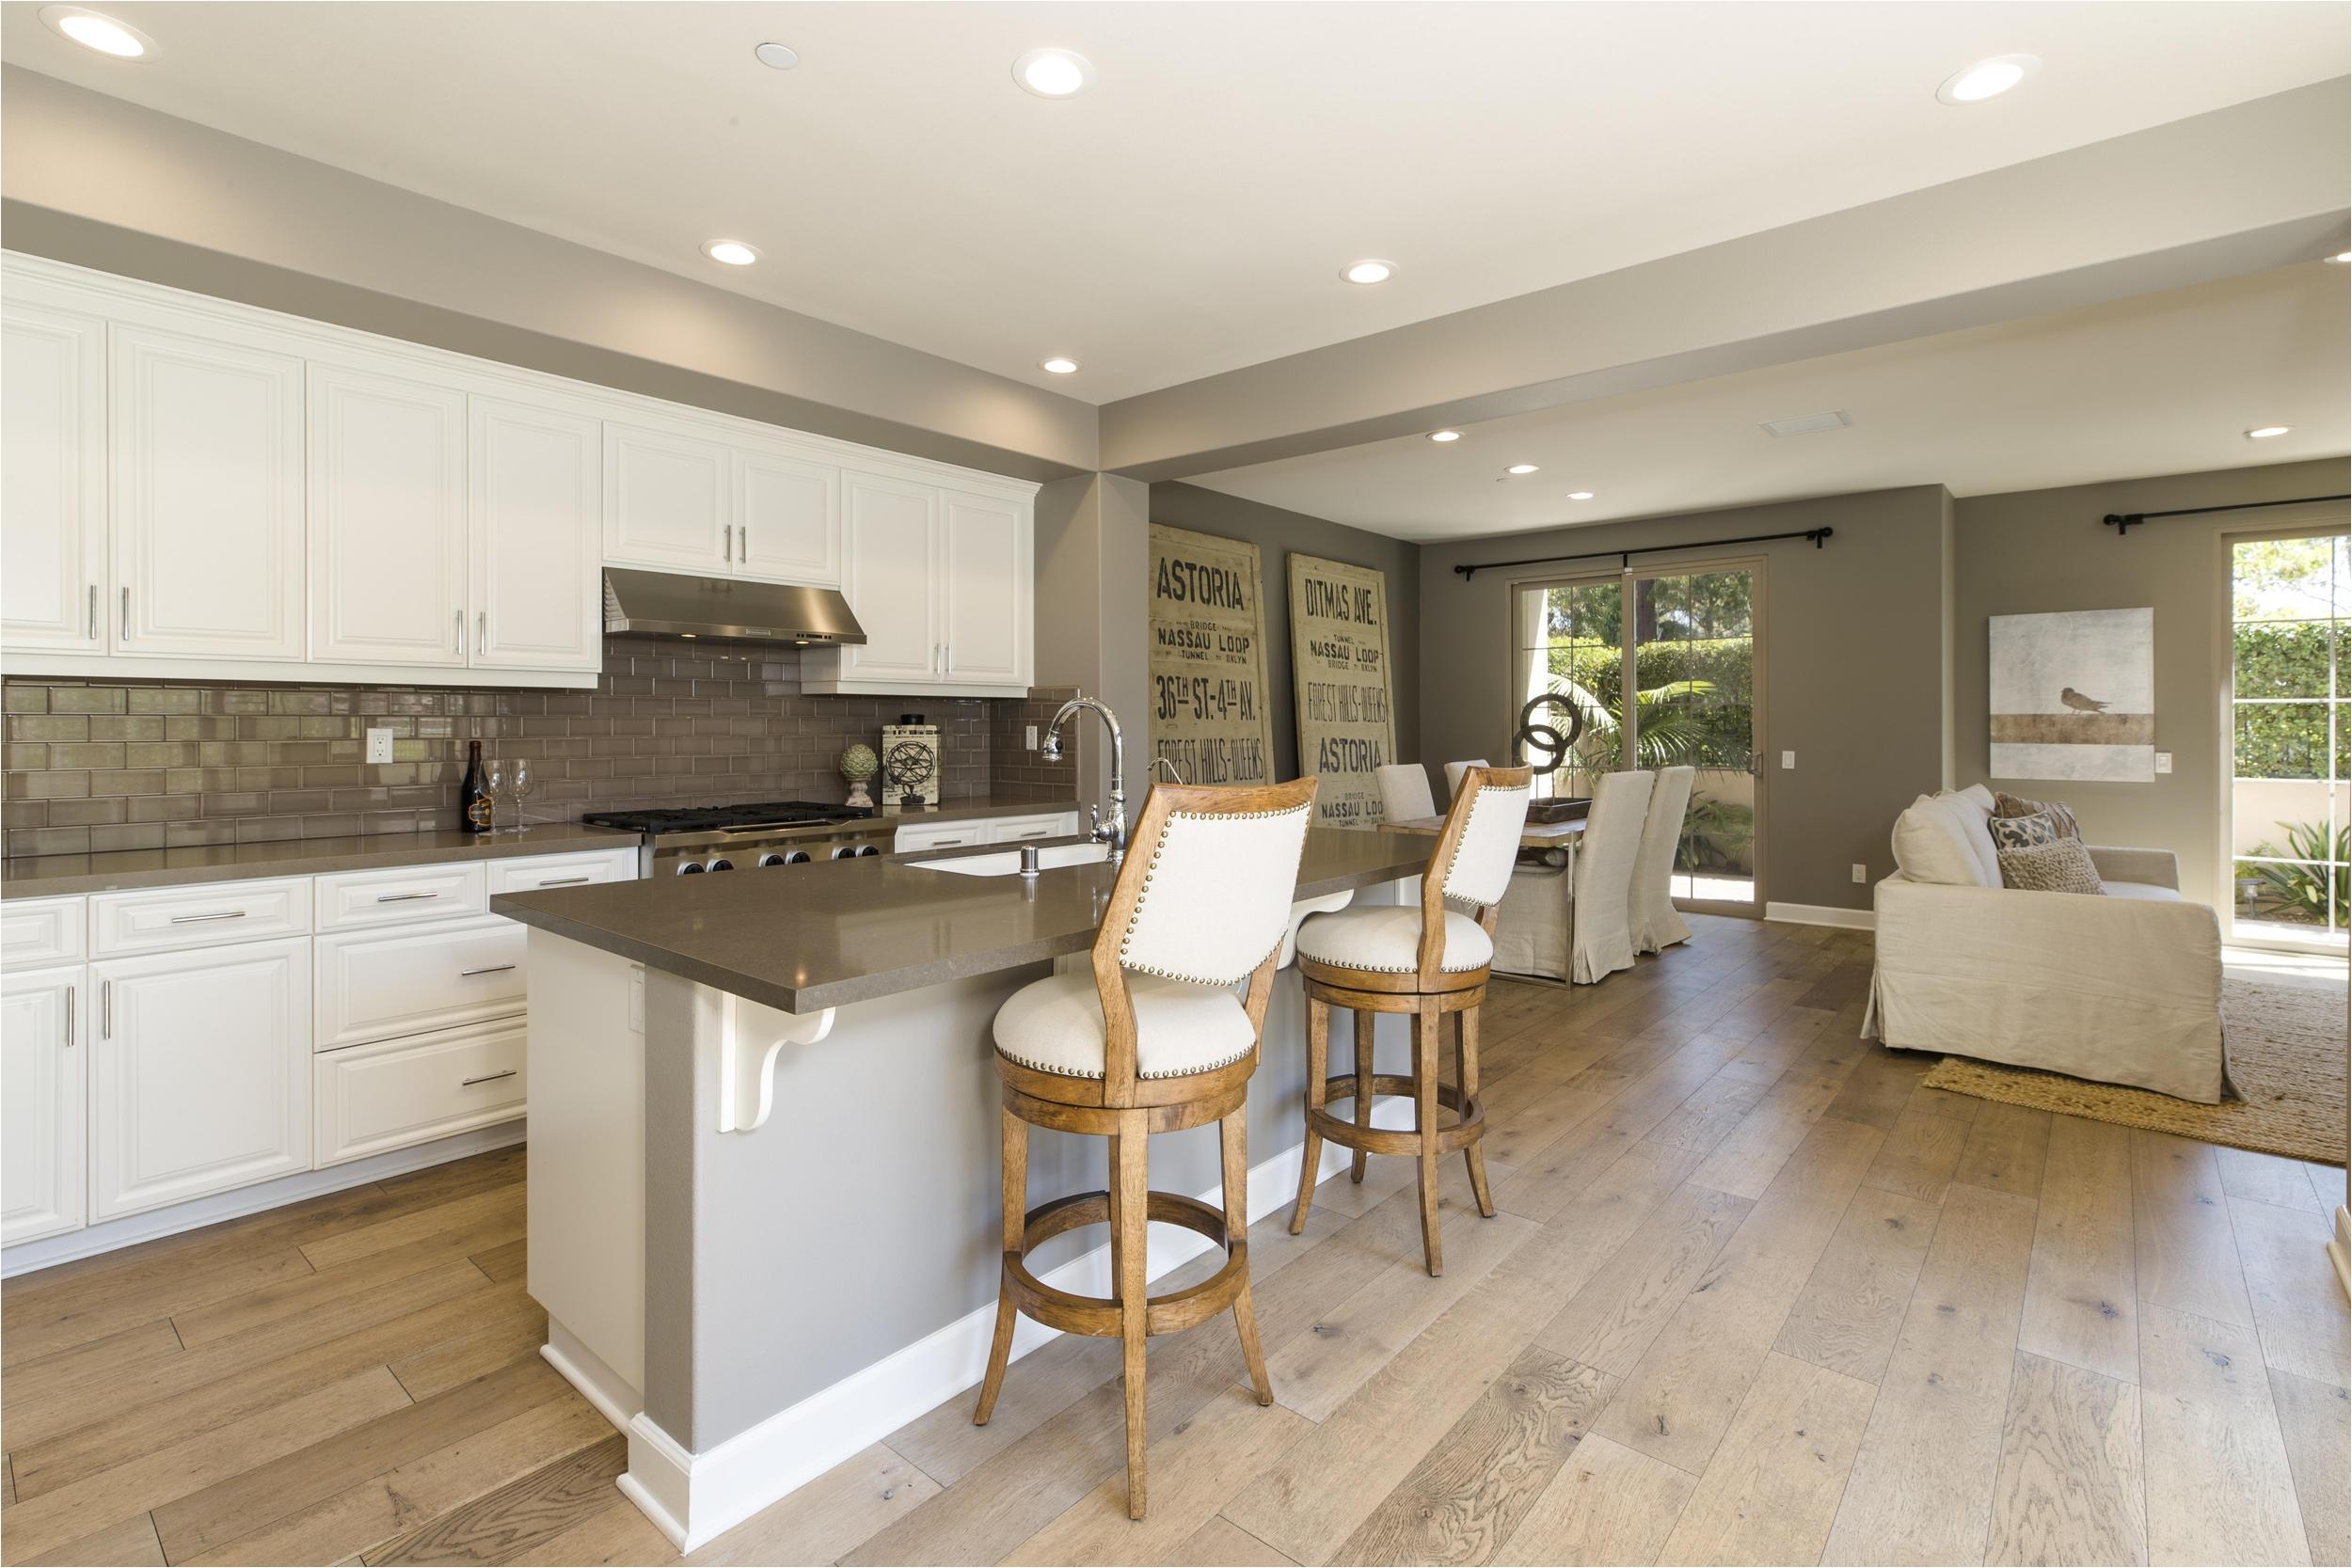 Homes for Sale In Santa Maria Ca 50 Sanderling Ln 6 Goleta Ca Mls 18 3444 Joanne Stoltz 805